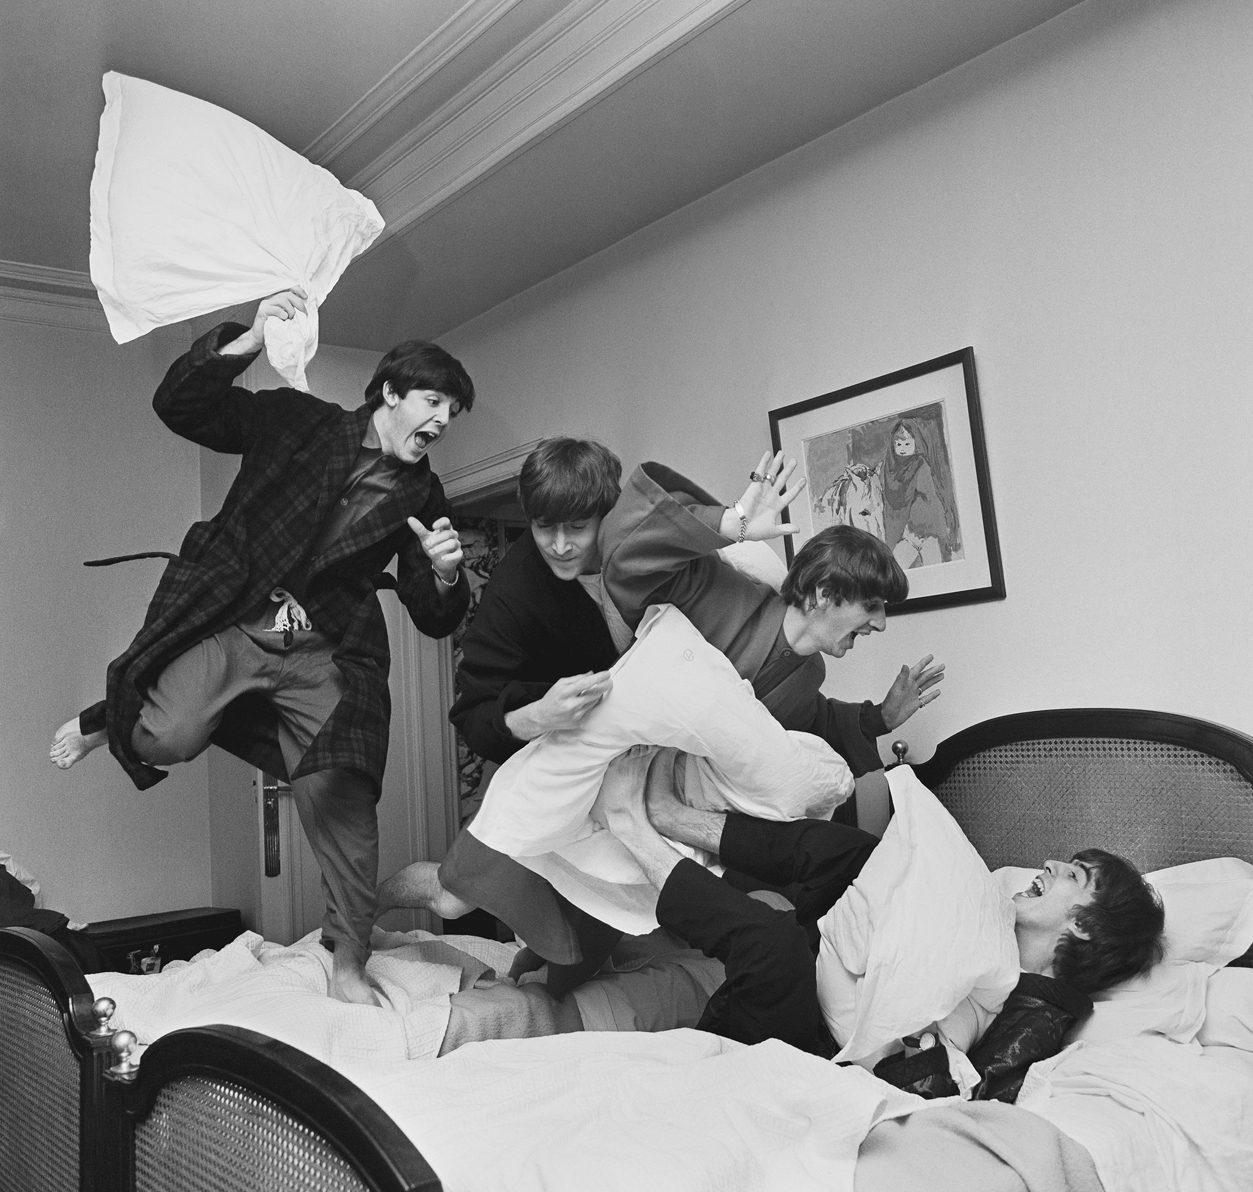 The Beatles (Pillow Fight) - Paris 1964